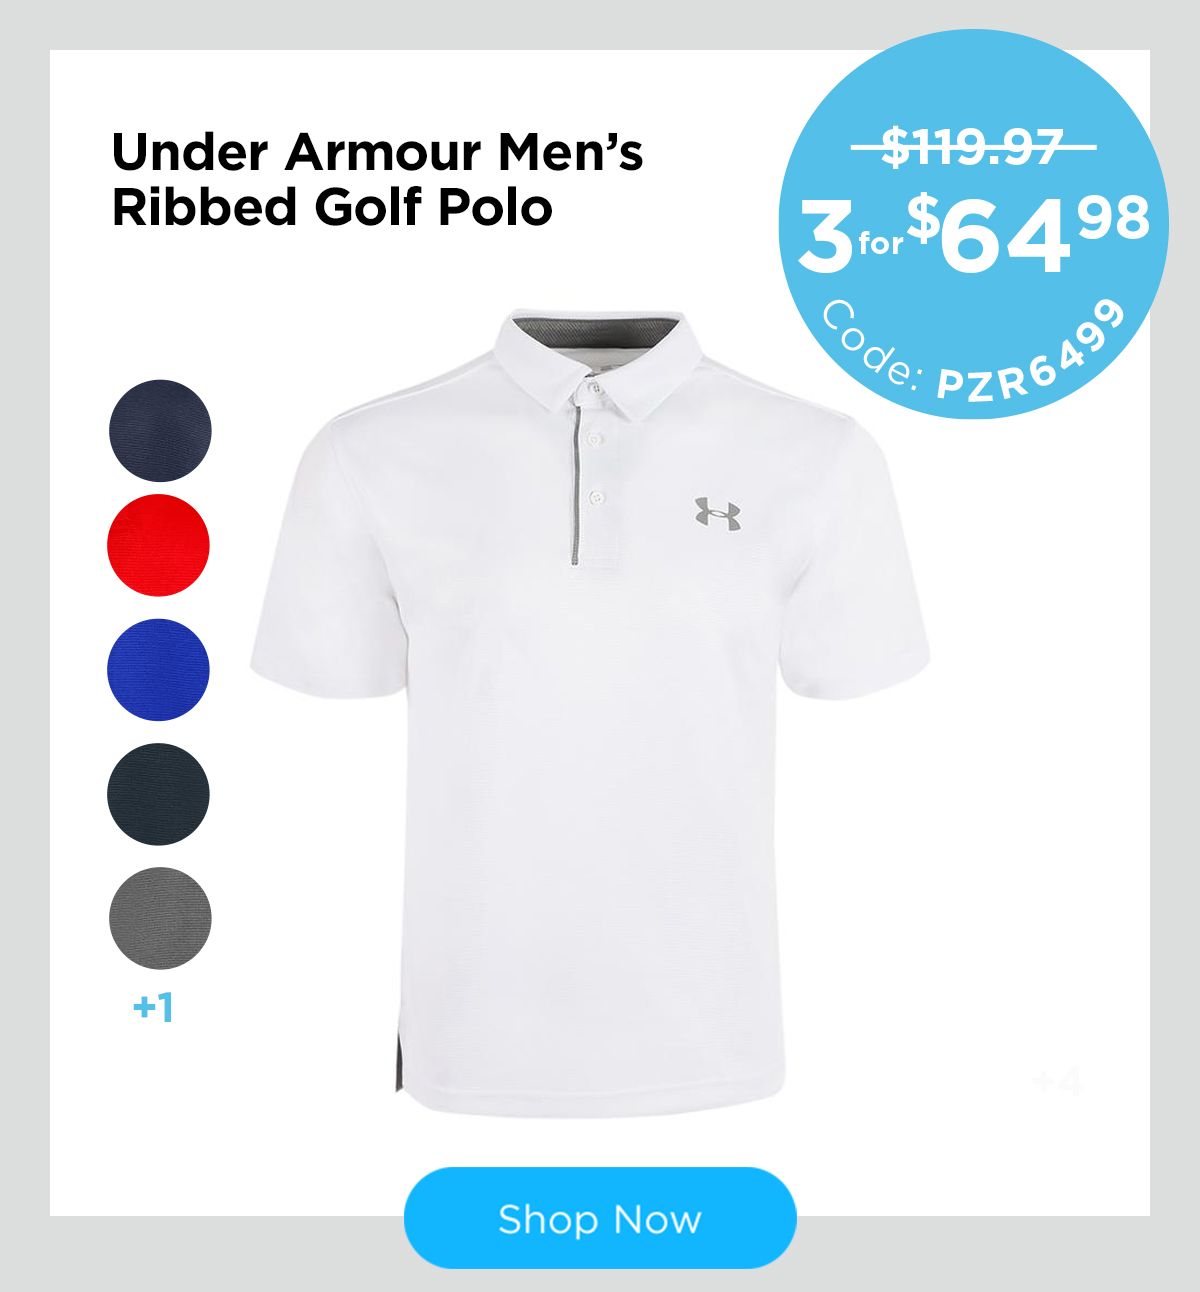 Under Armour Men's Ribbed Golf Polo